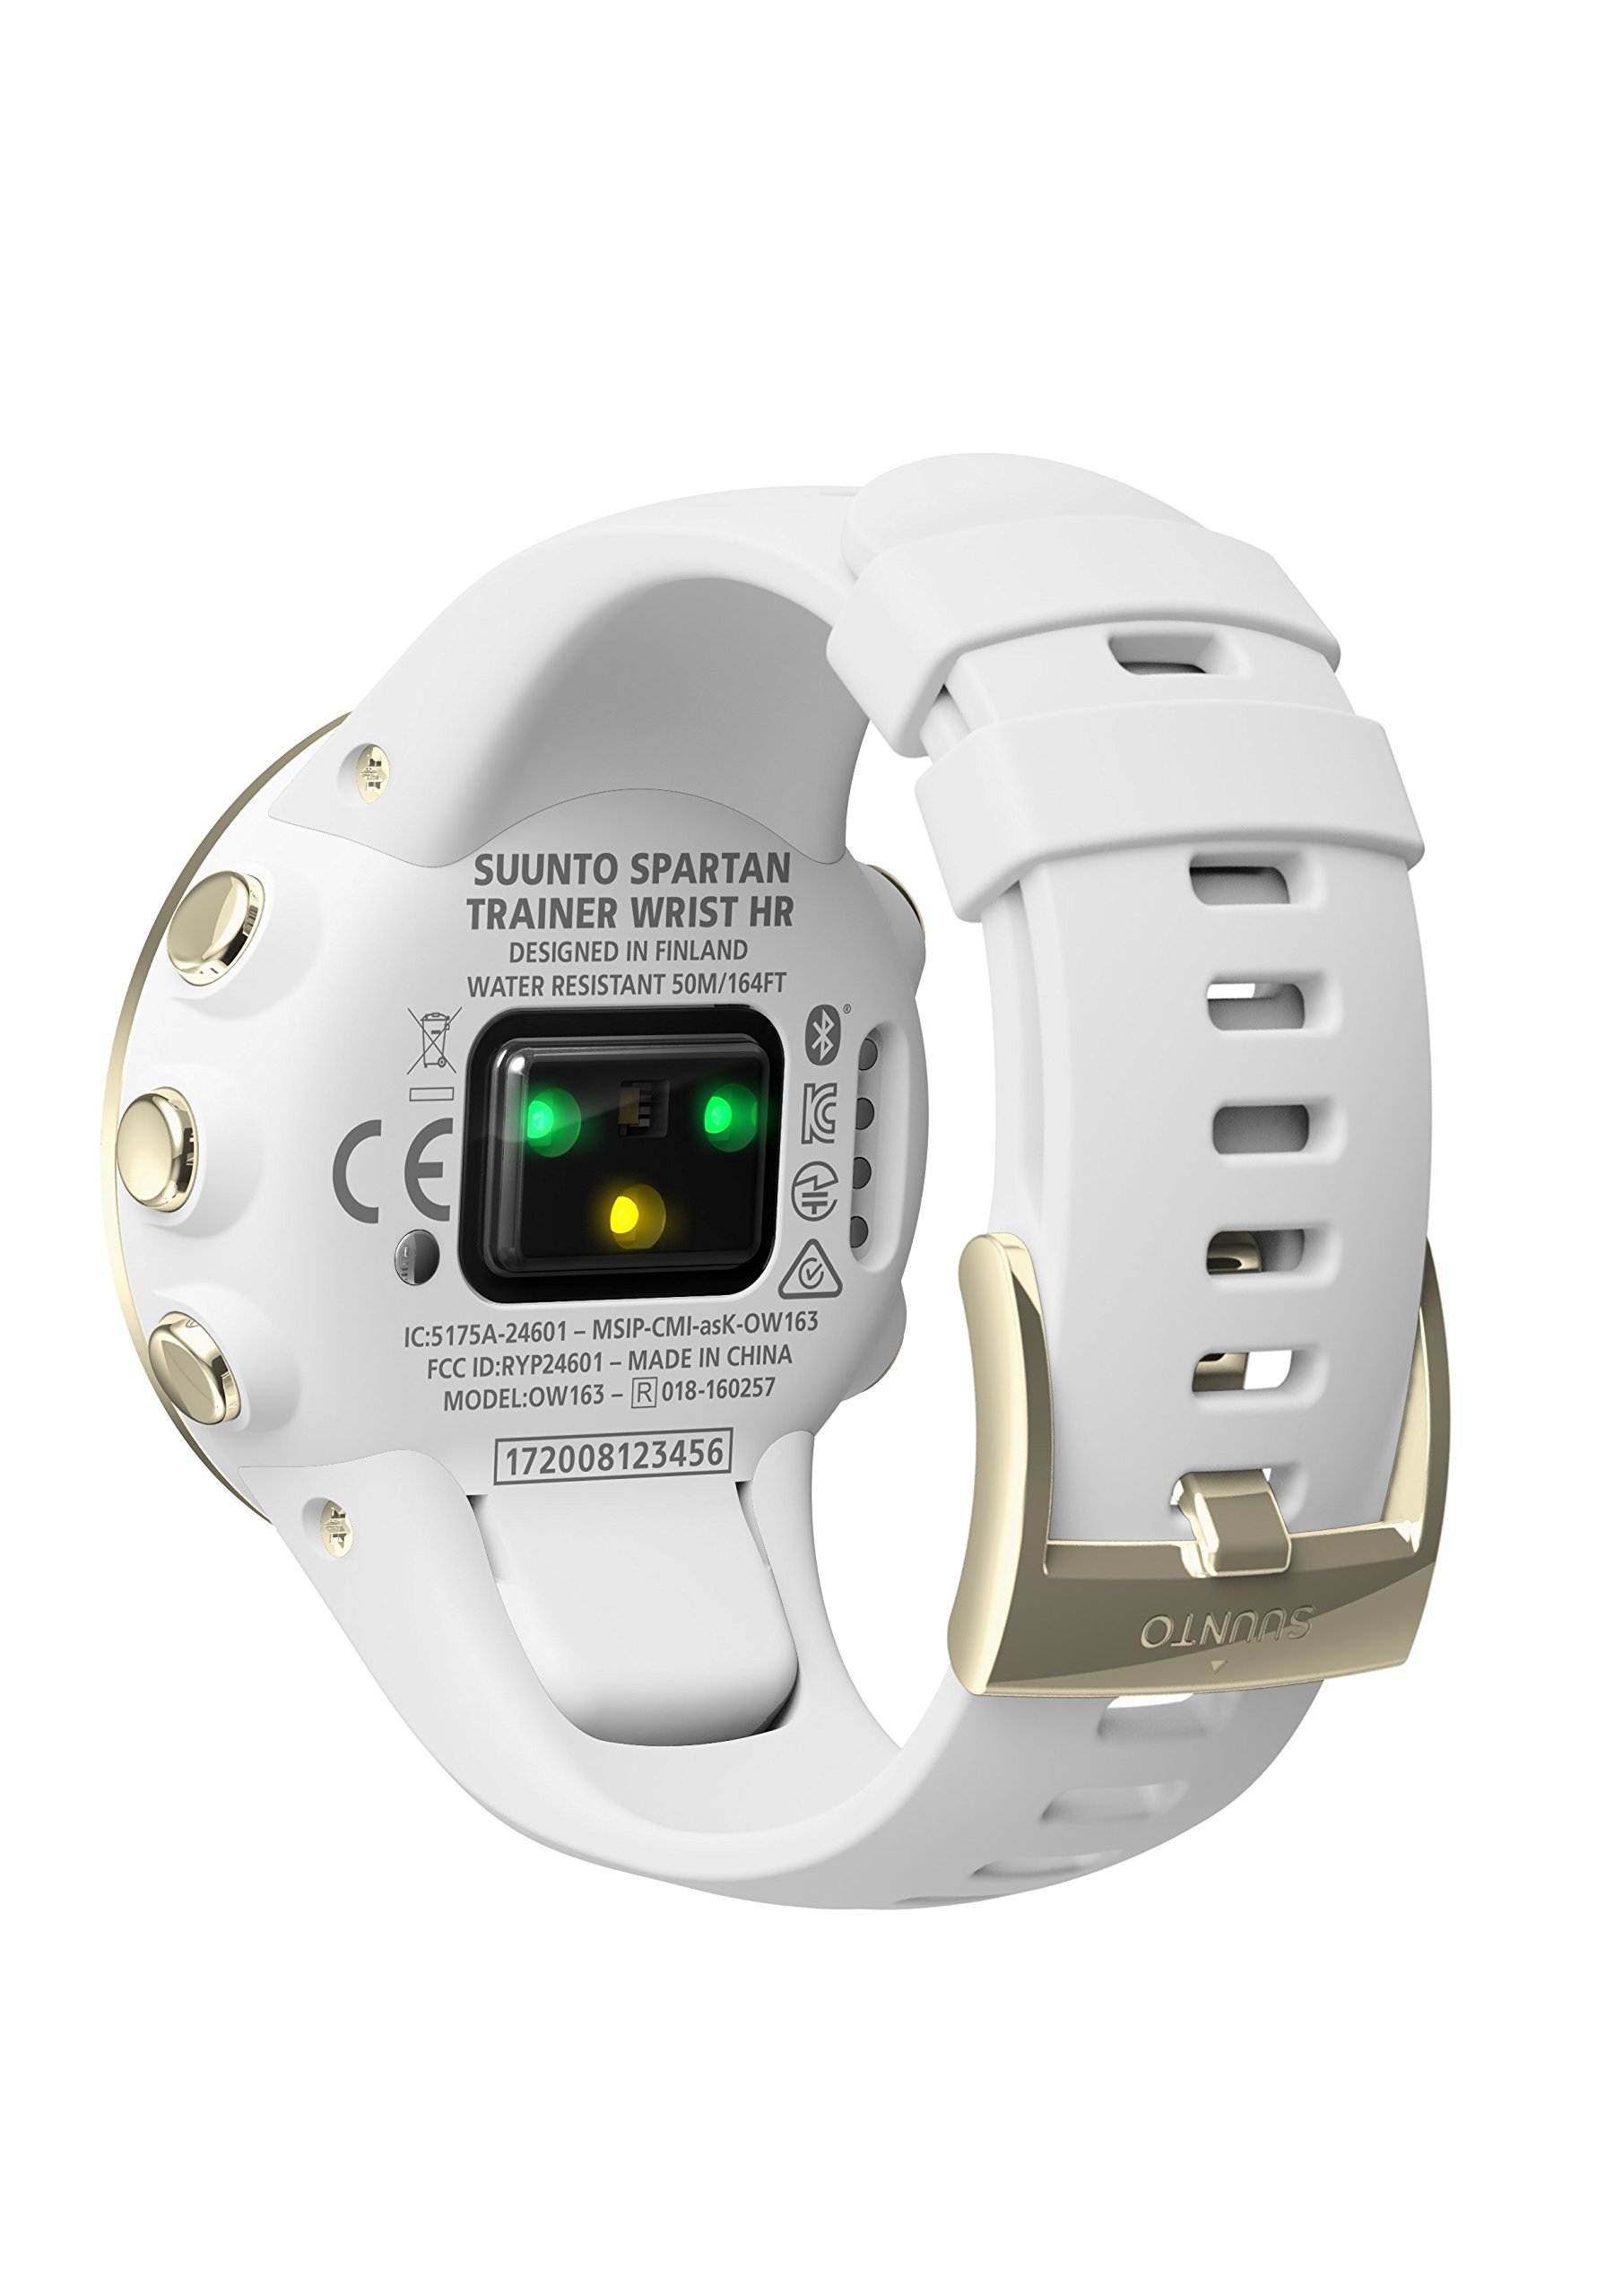 Suunto Spartan Trainer Wrist HR Multisport GPS Watch (Gold) by Suunto (Image #9)